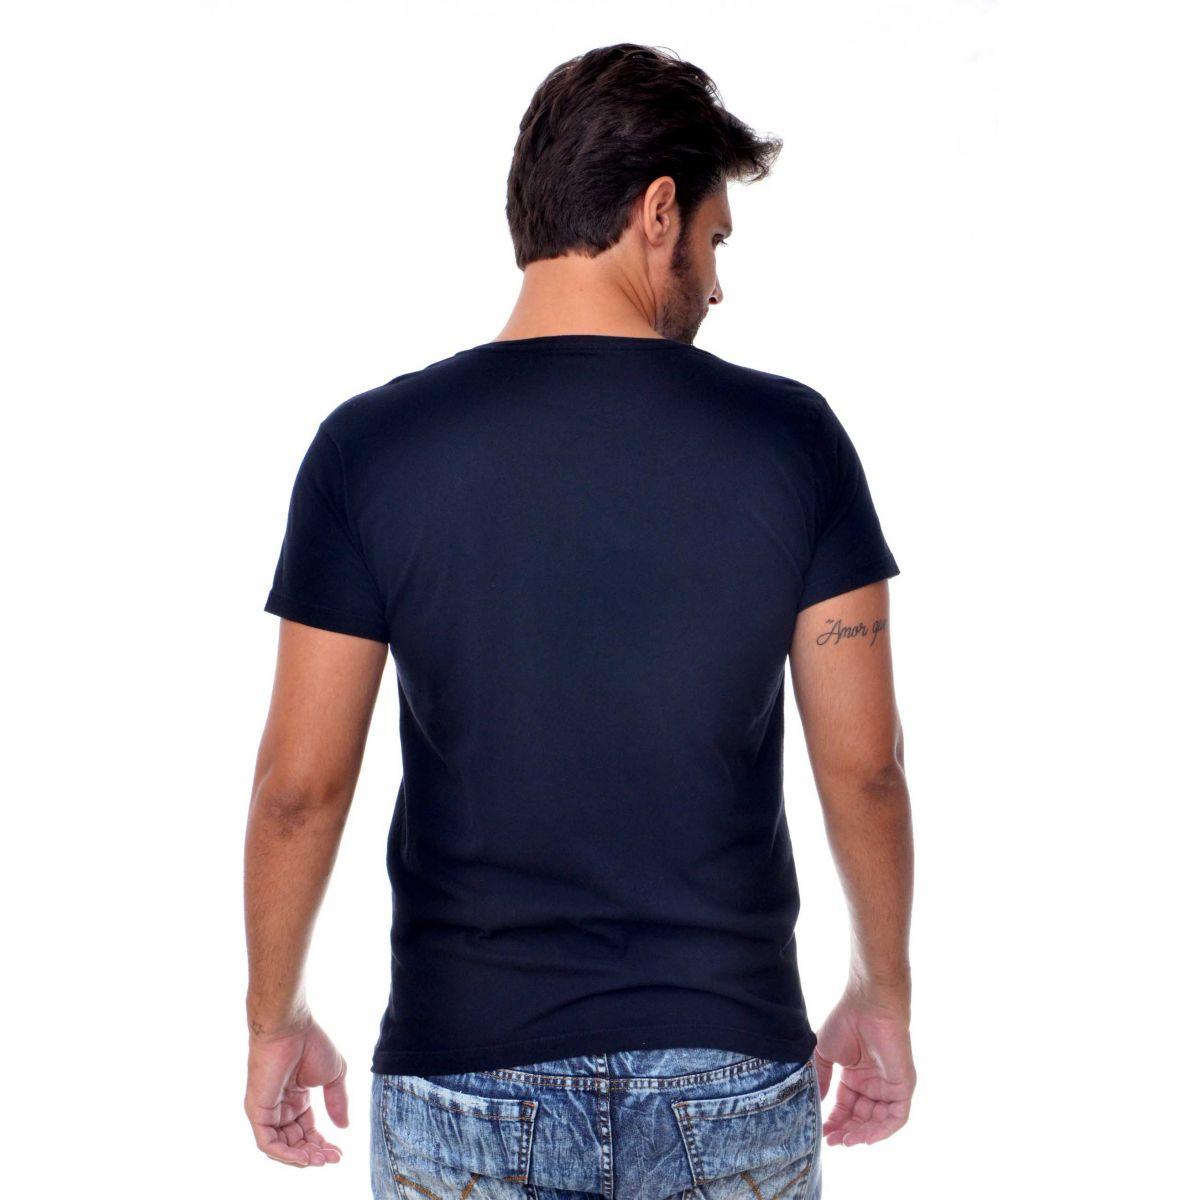 Camiseta Osklen Rj Sp Preta  - Ca Brasileira